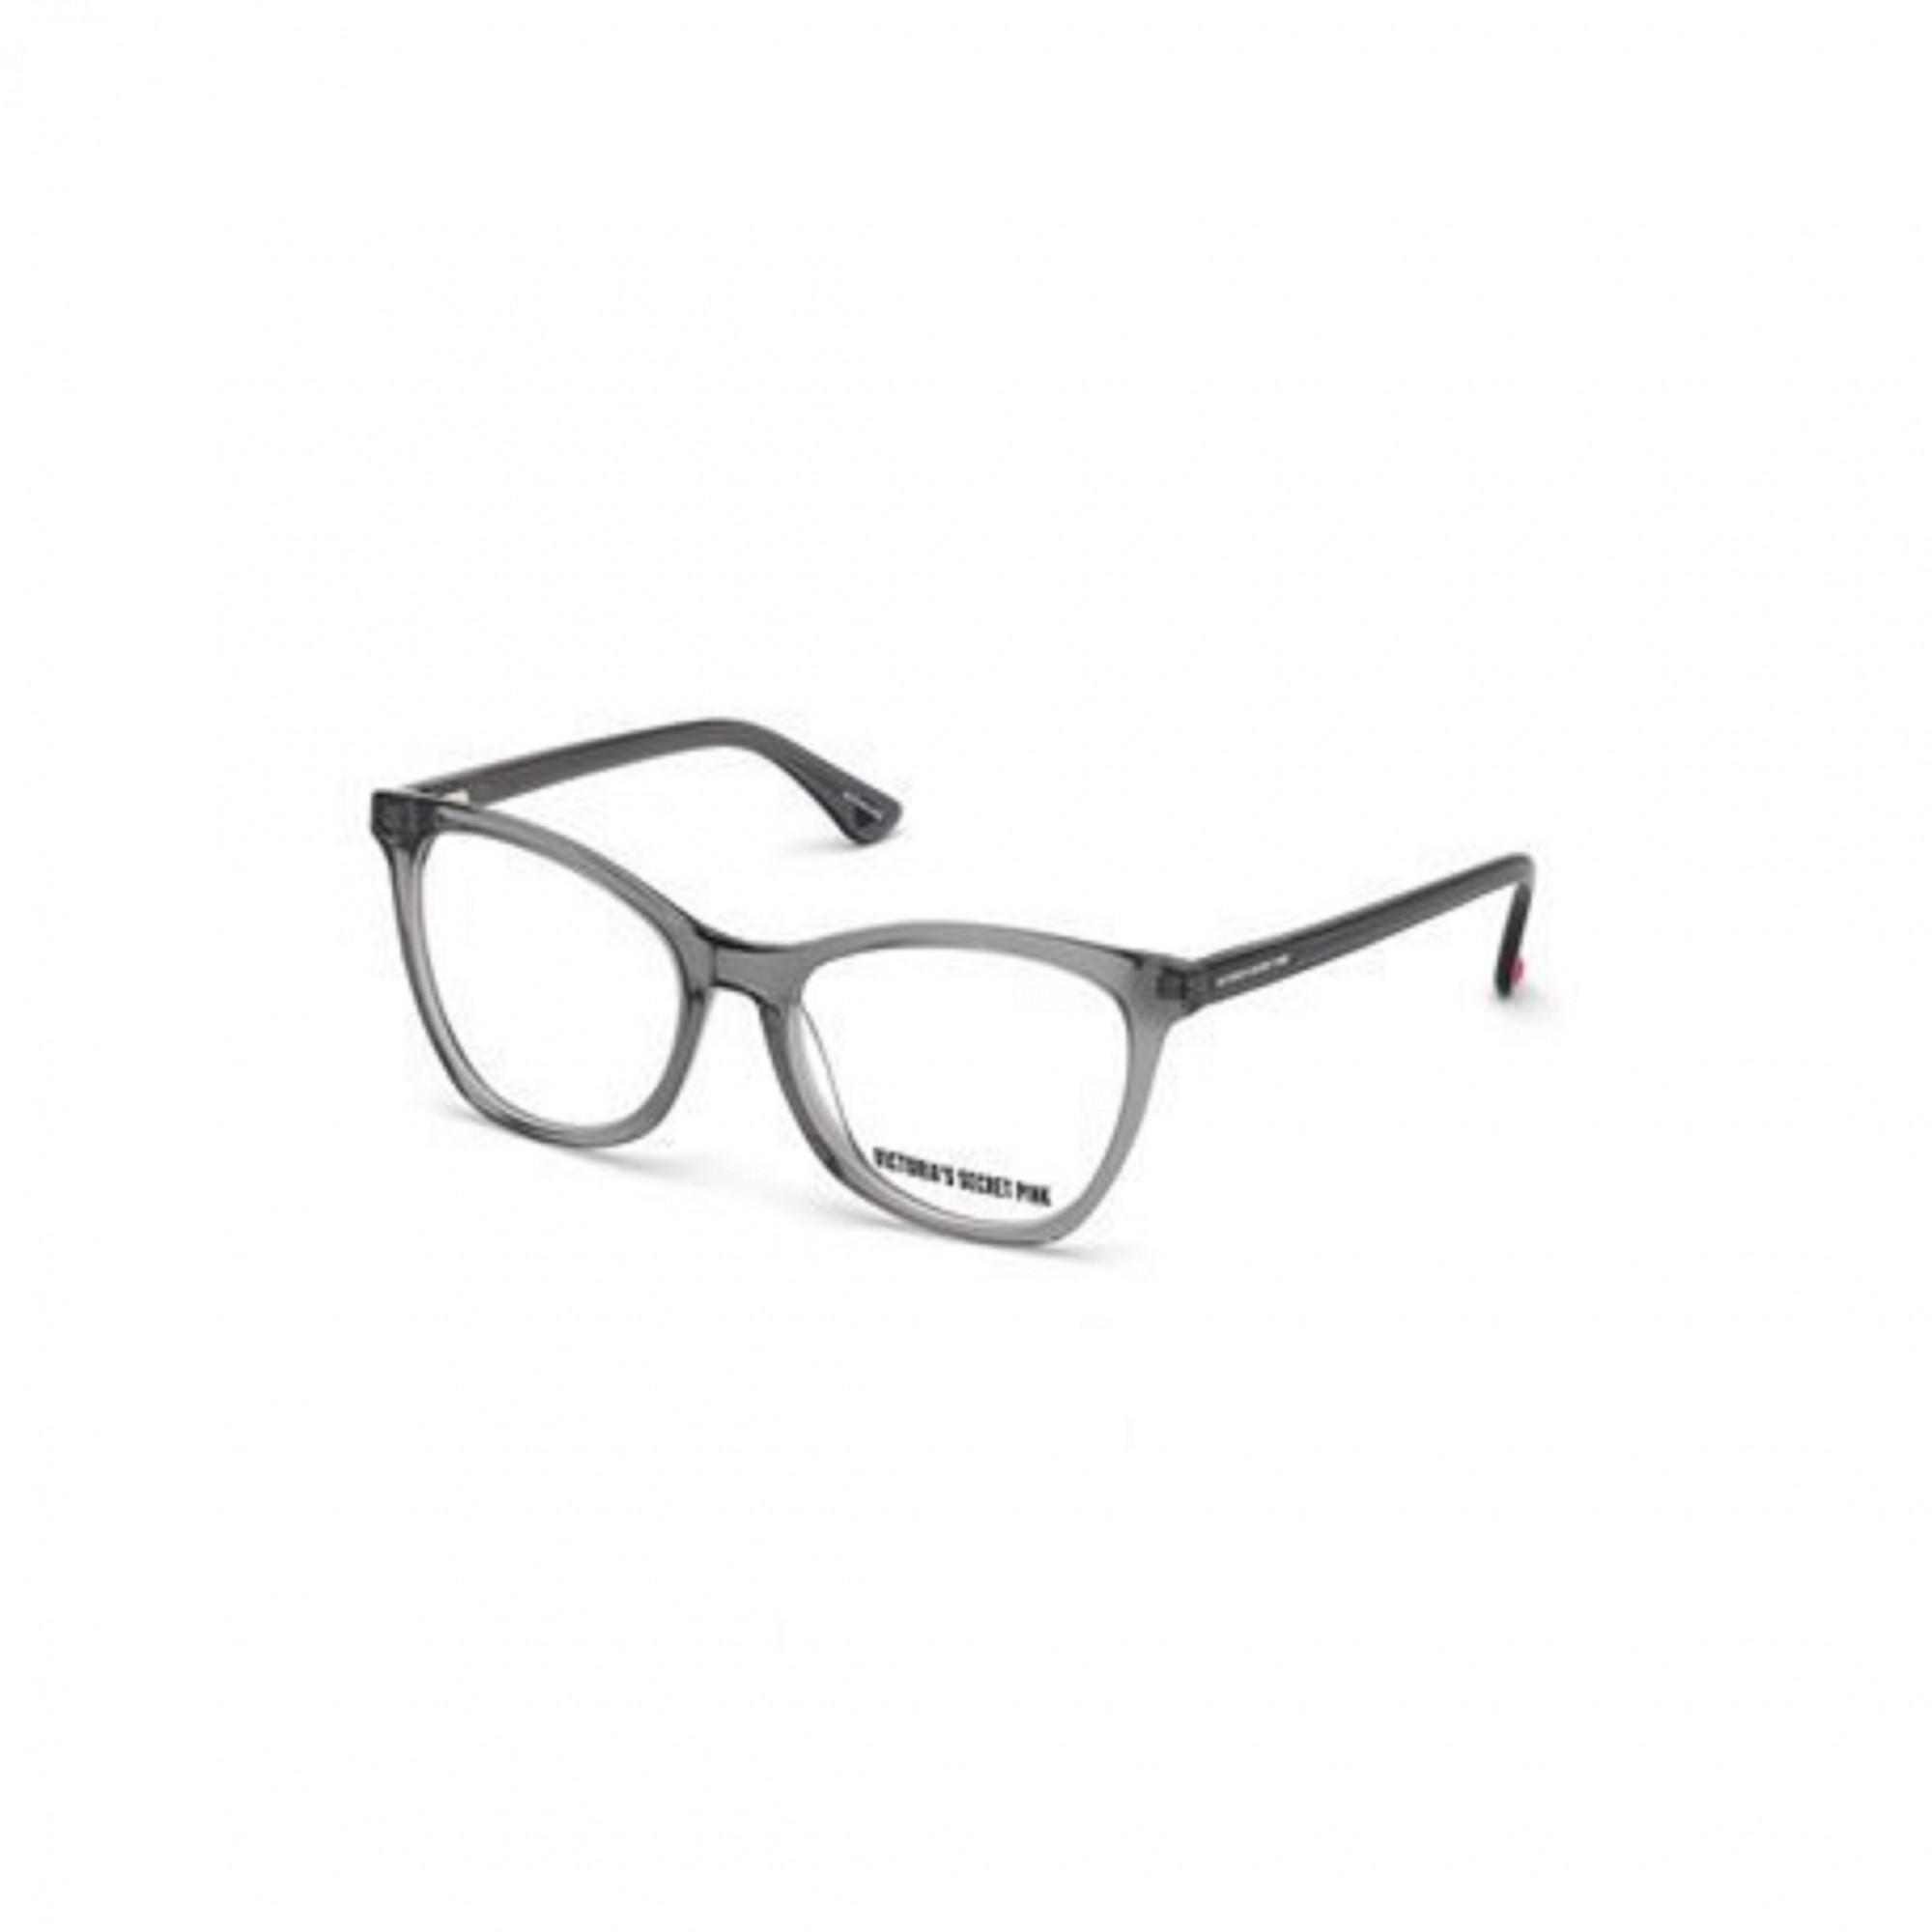 Óculos de Grau Victoria's Secret Pink Preto PK5007 - 001/53